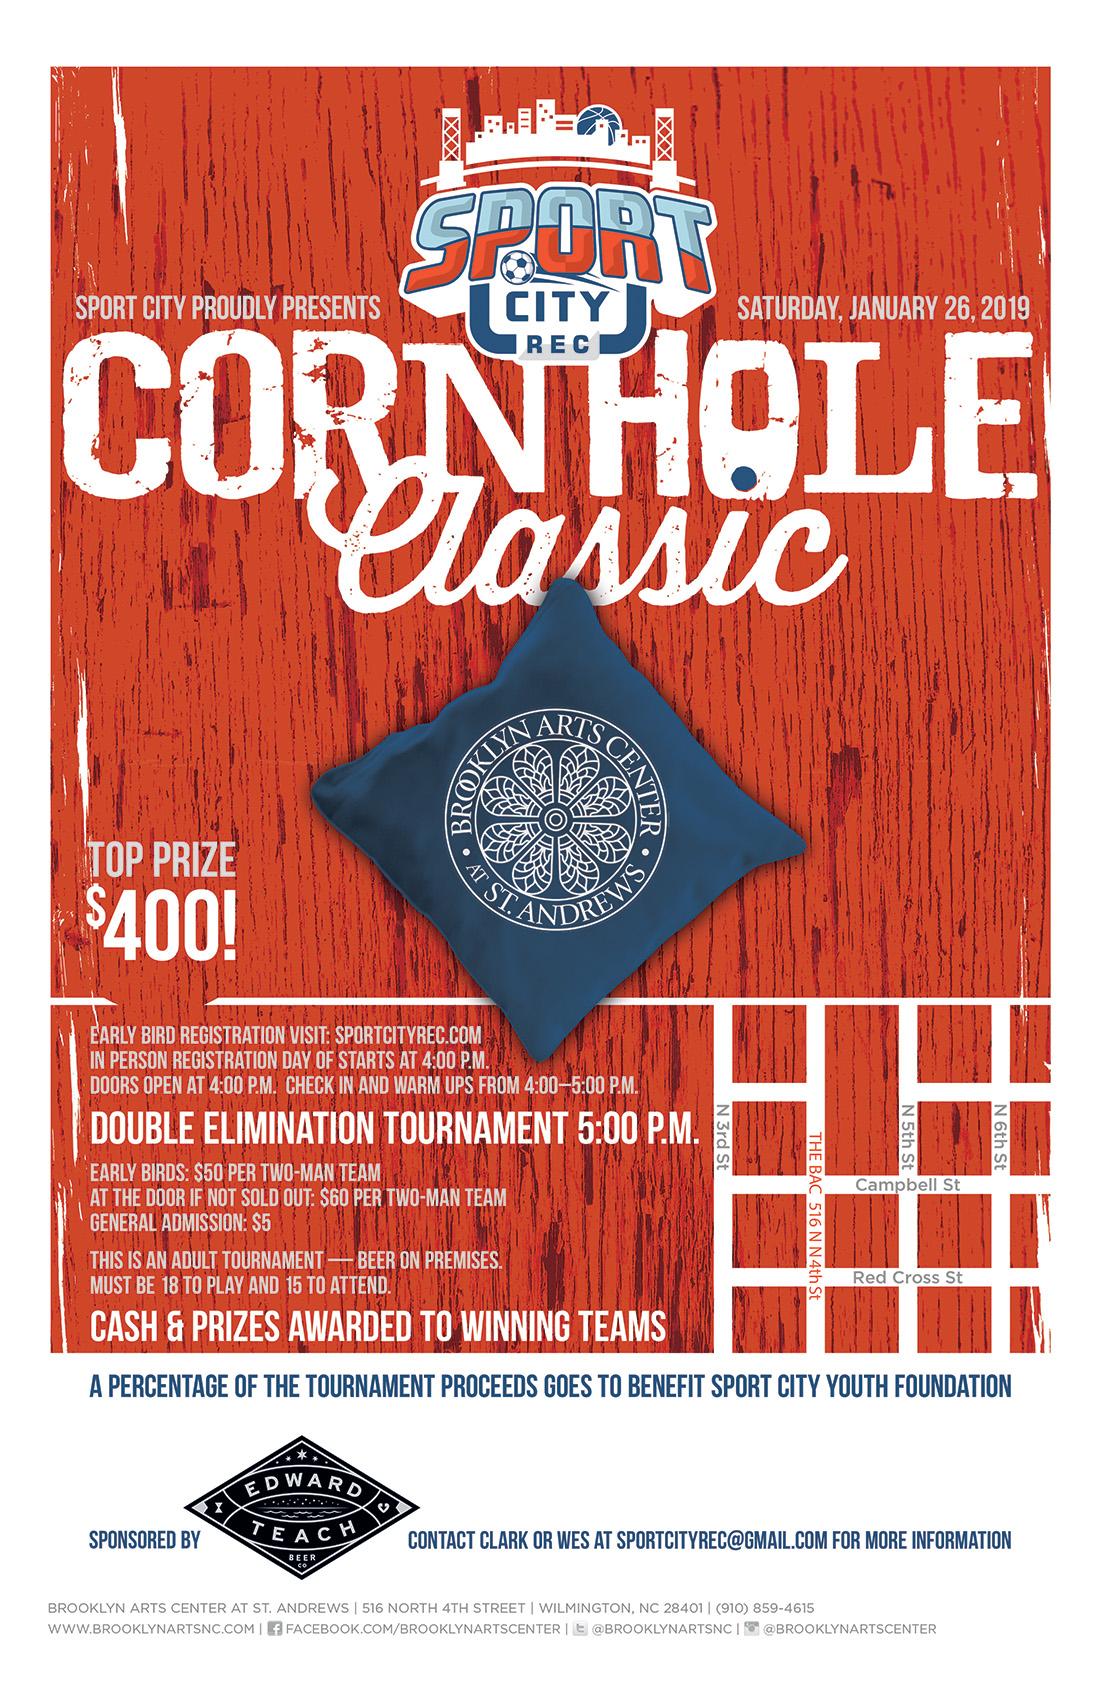 BAC-2128-Corn Hole Classic_poster_p4.jpg